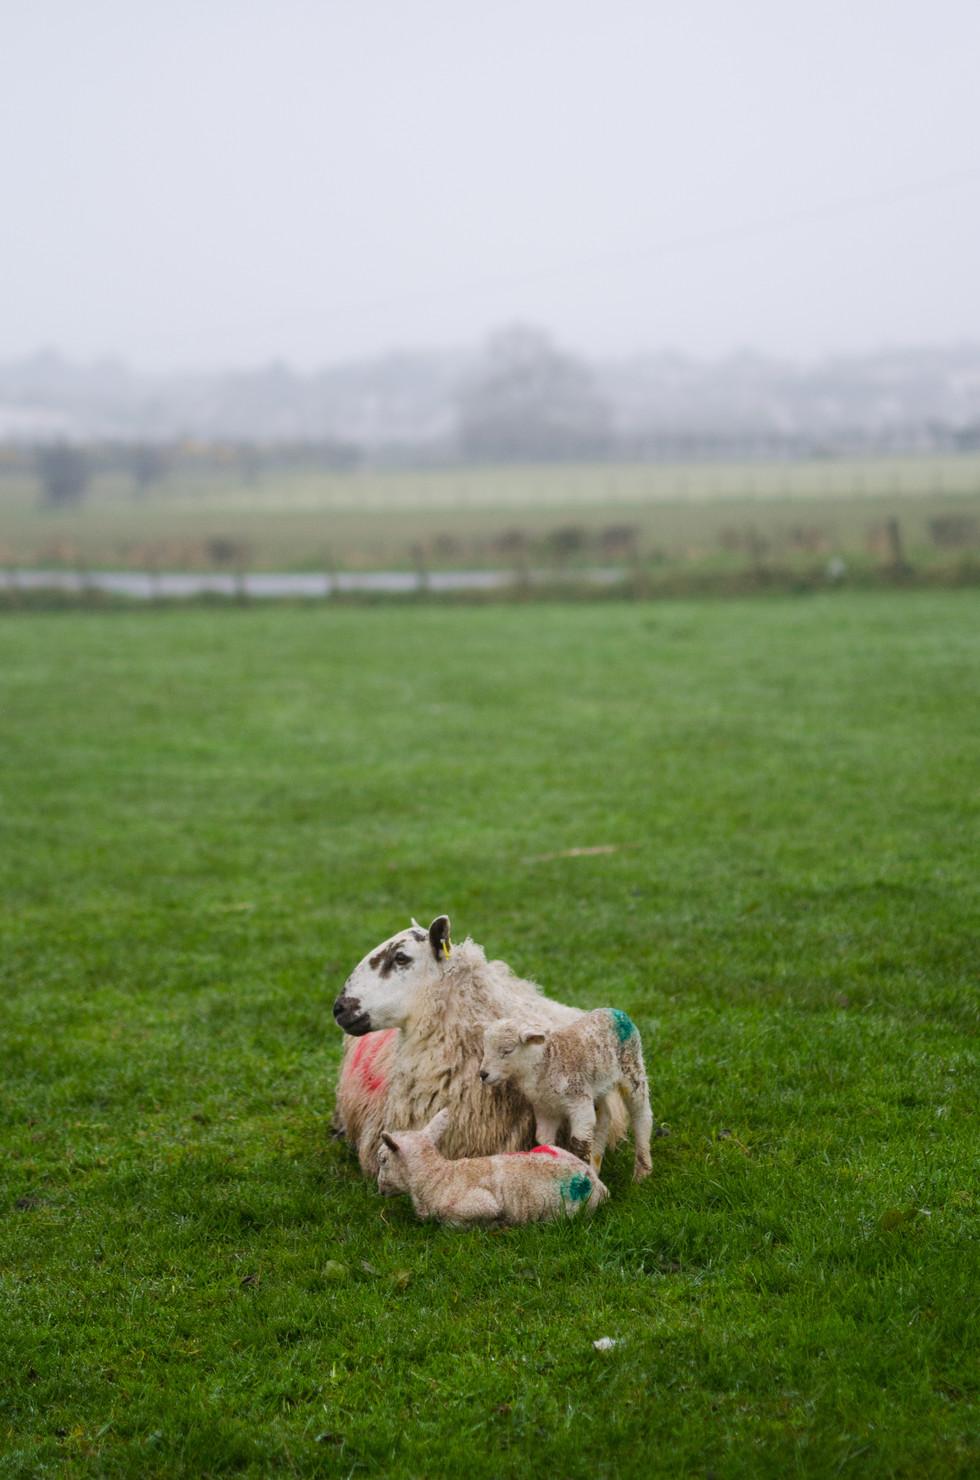 Sheep_007